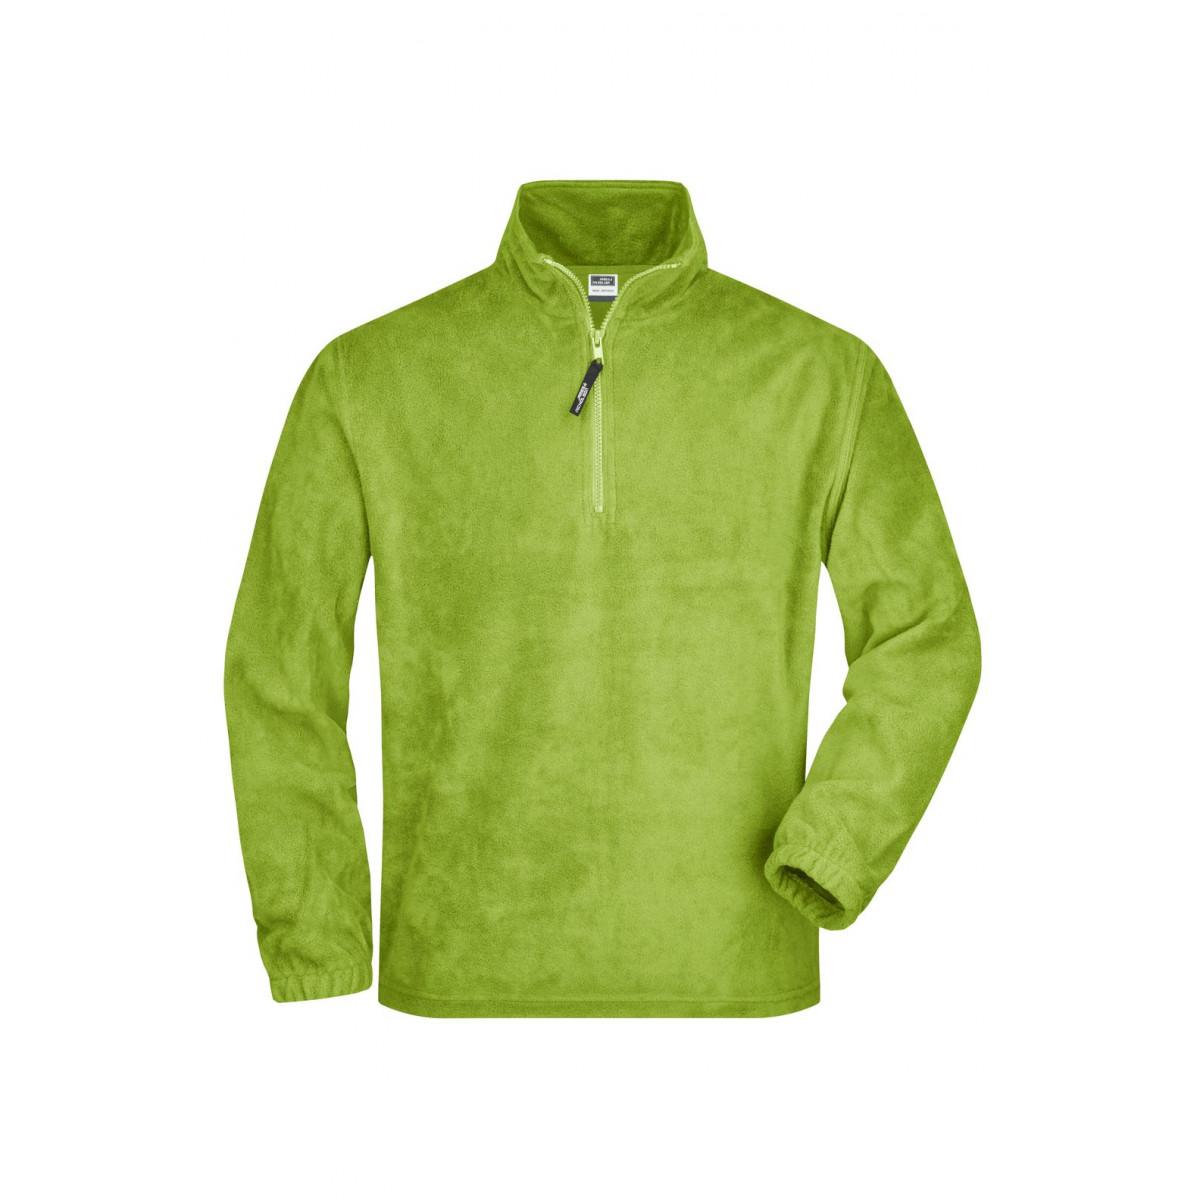 Толстовка мужская JN043 Half-Zip Fleece - Лайм